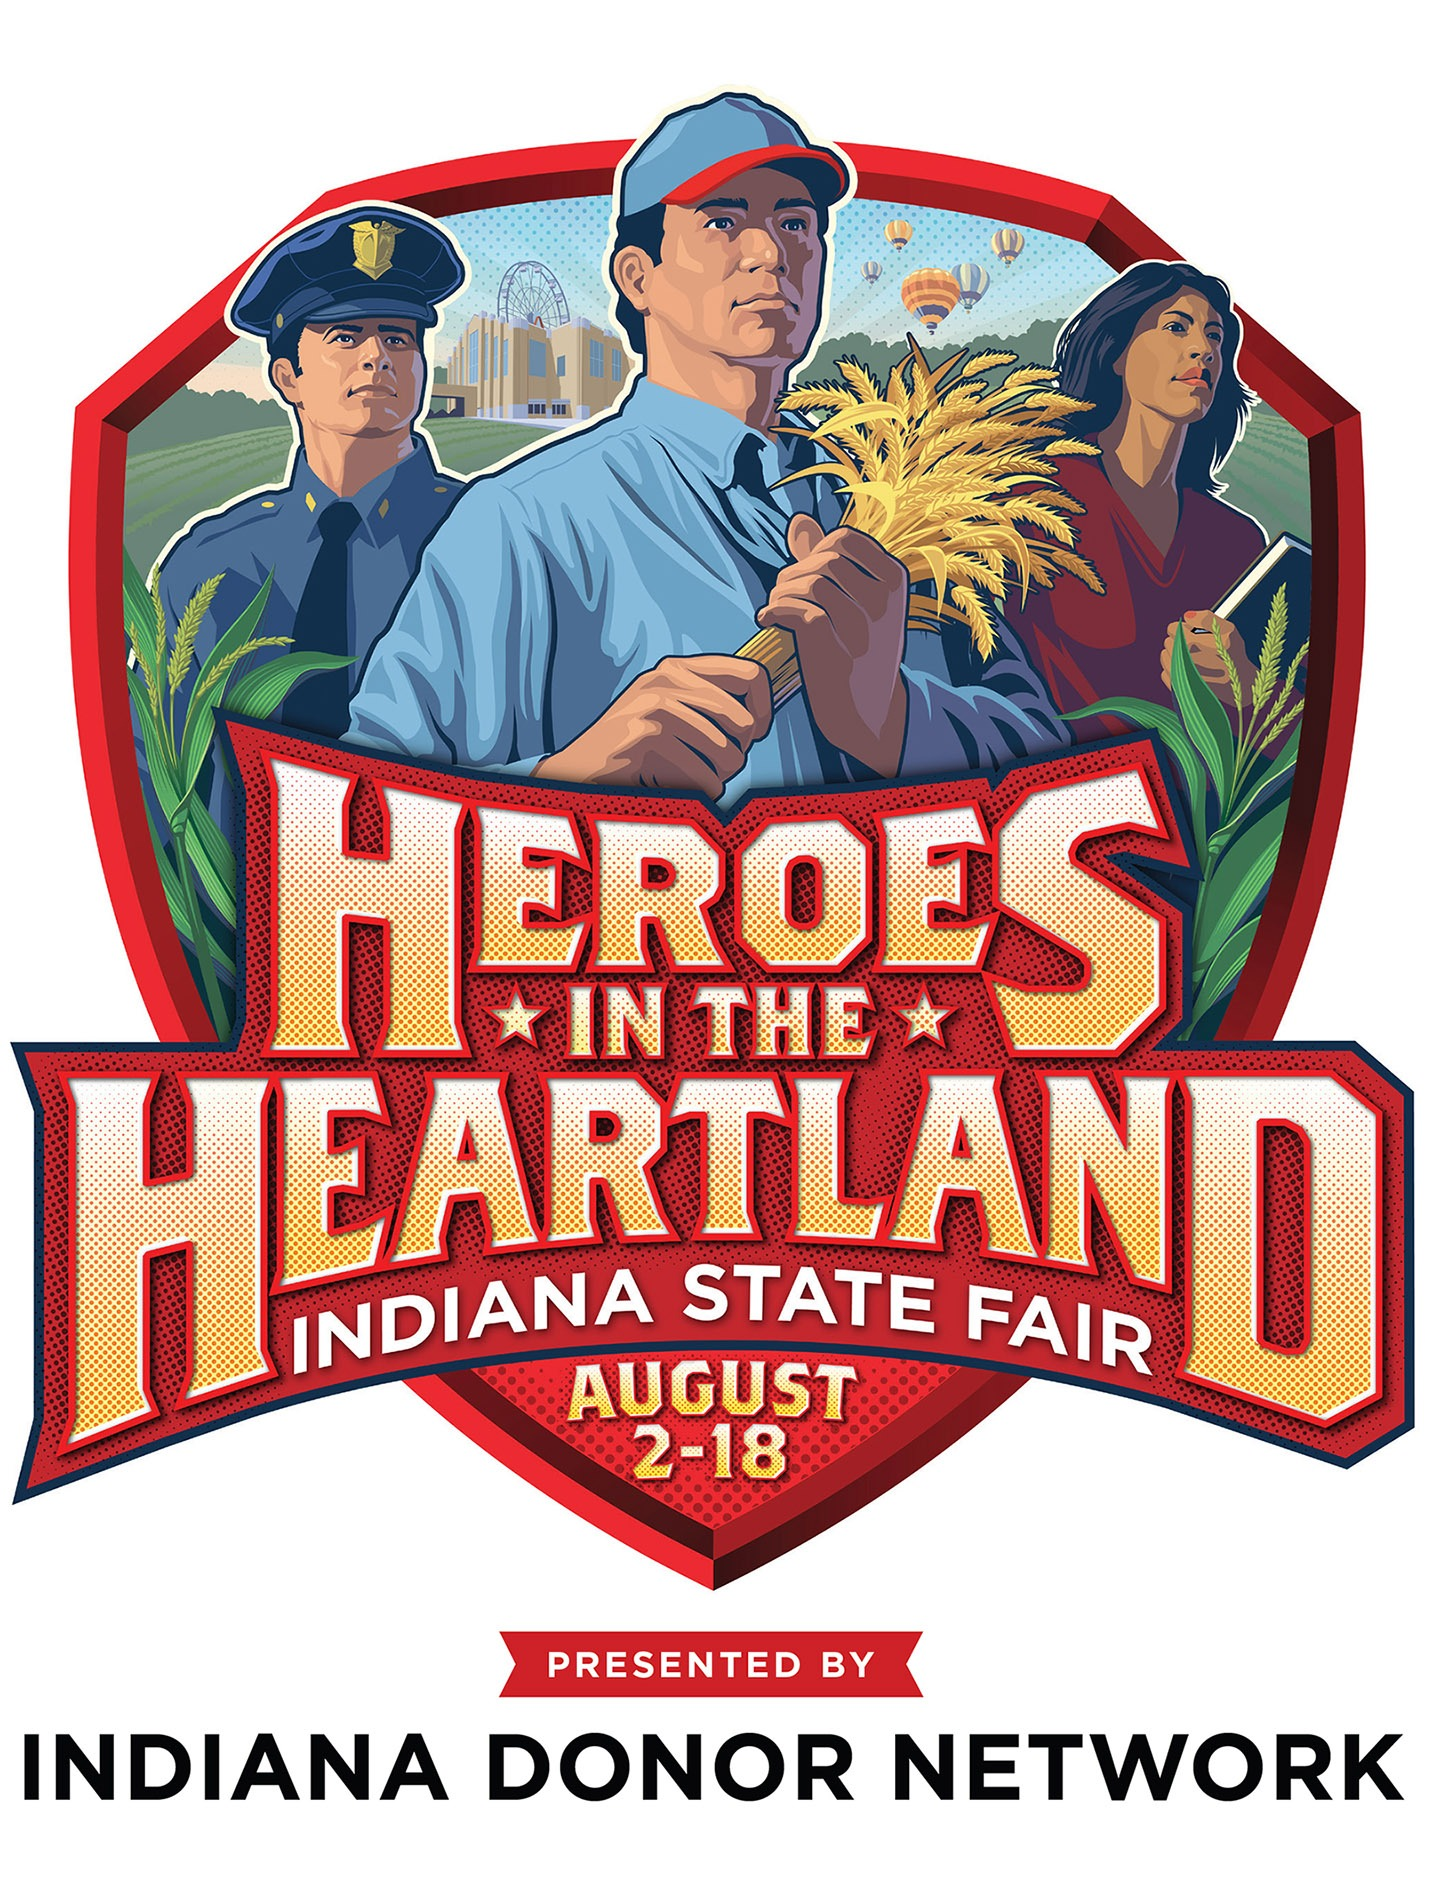 Indiana State Fair 2019 logo